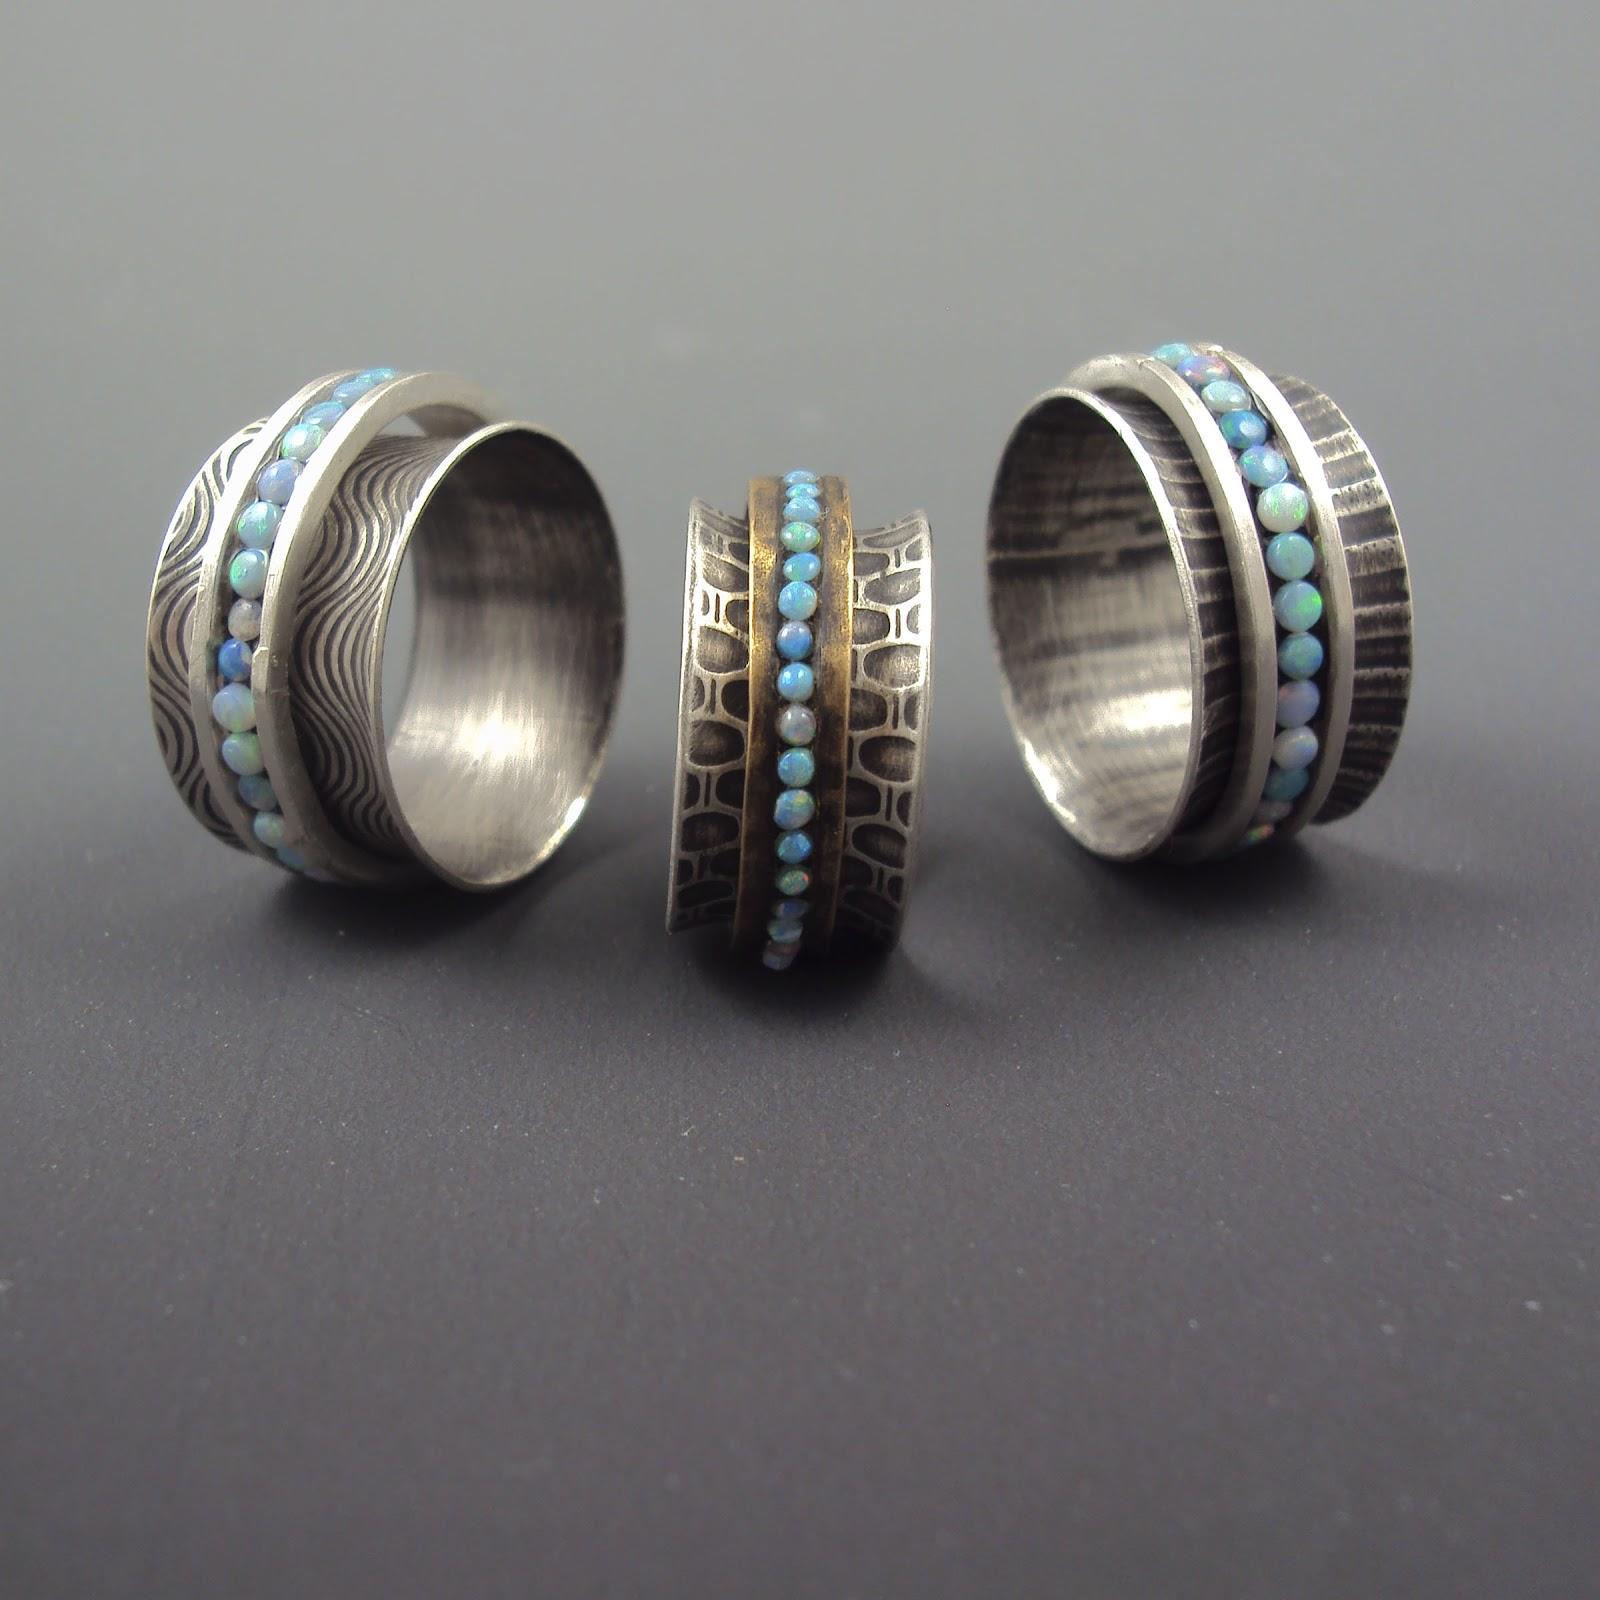 Dana Evans Studio Blog New Spinner Rings. Gold Bangle Bracelets For Sale. 2 Carat Sapphire. Earrings Pearls. Pink Engagement Rings. Art Rings. 7 Stone Anniversary Band. Sisterhood Bracelet. Jewellery Brooch